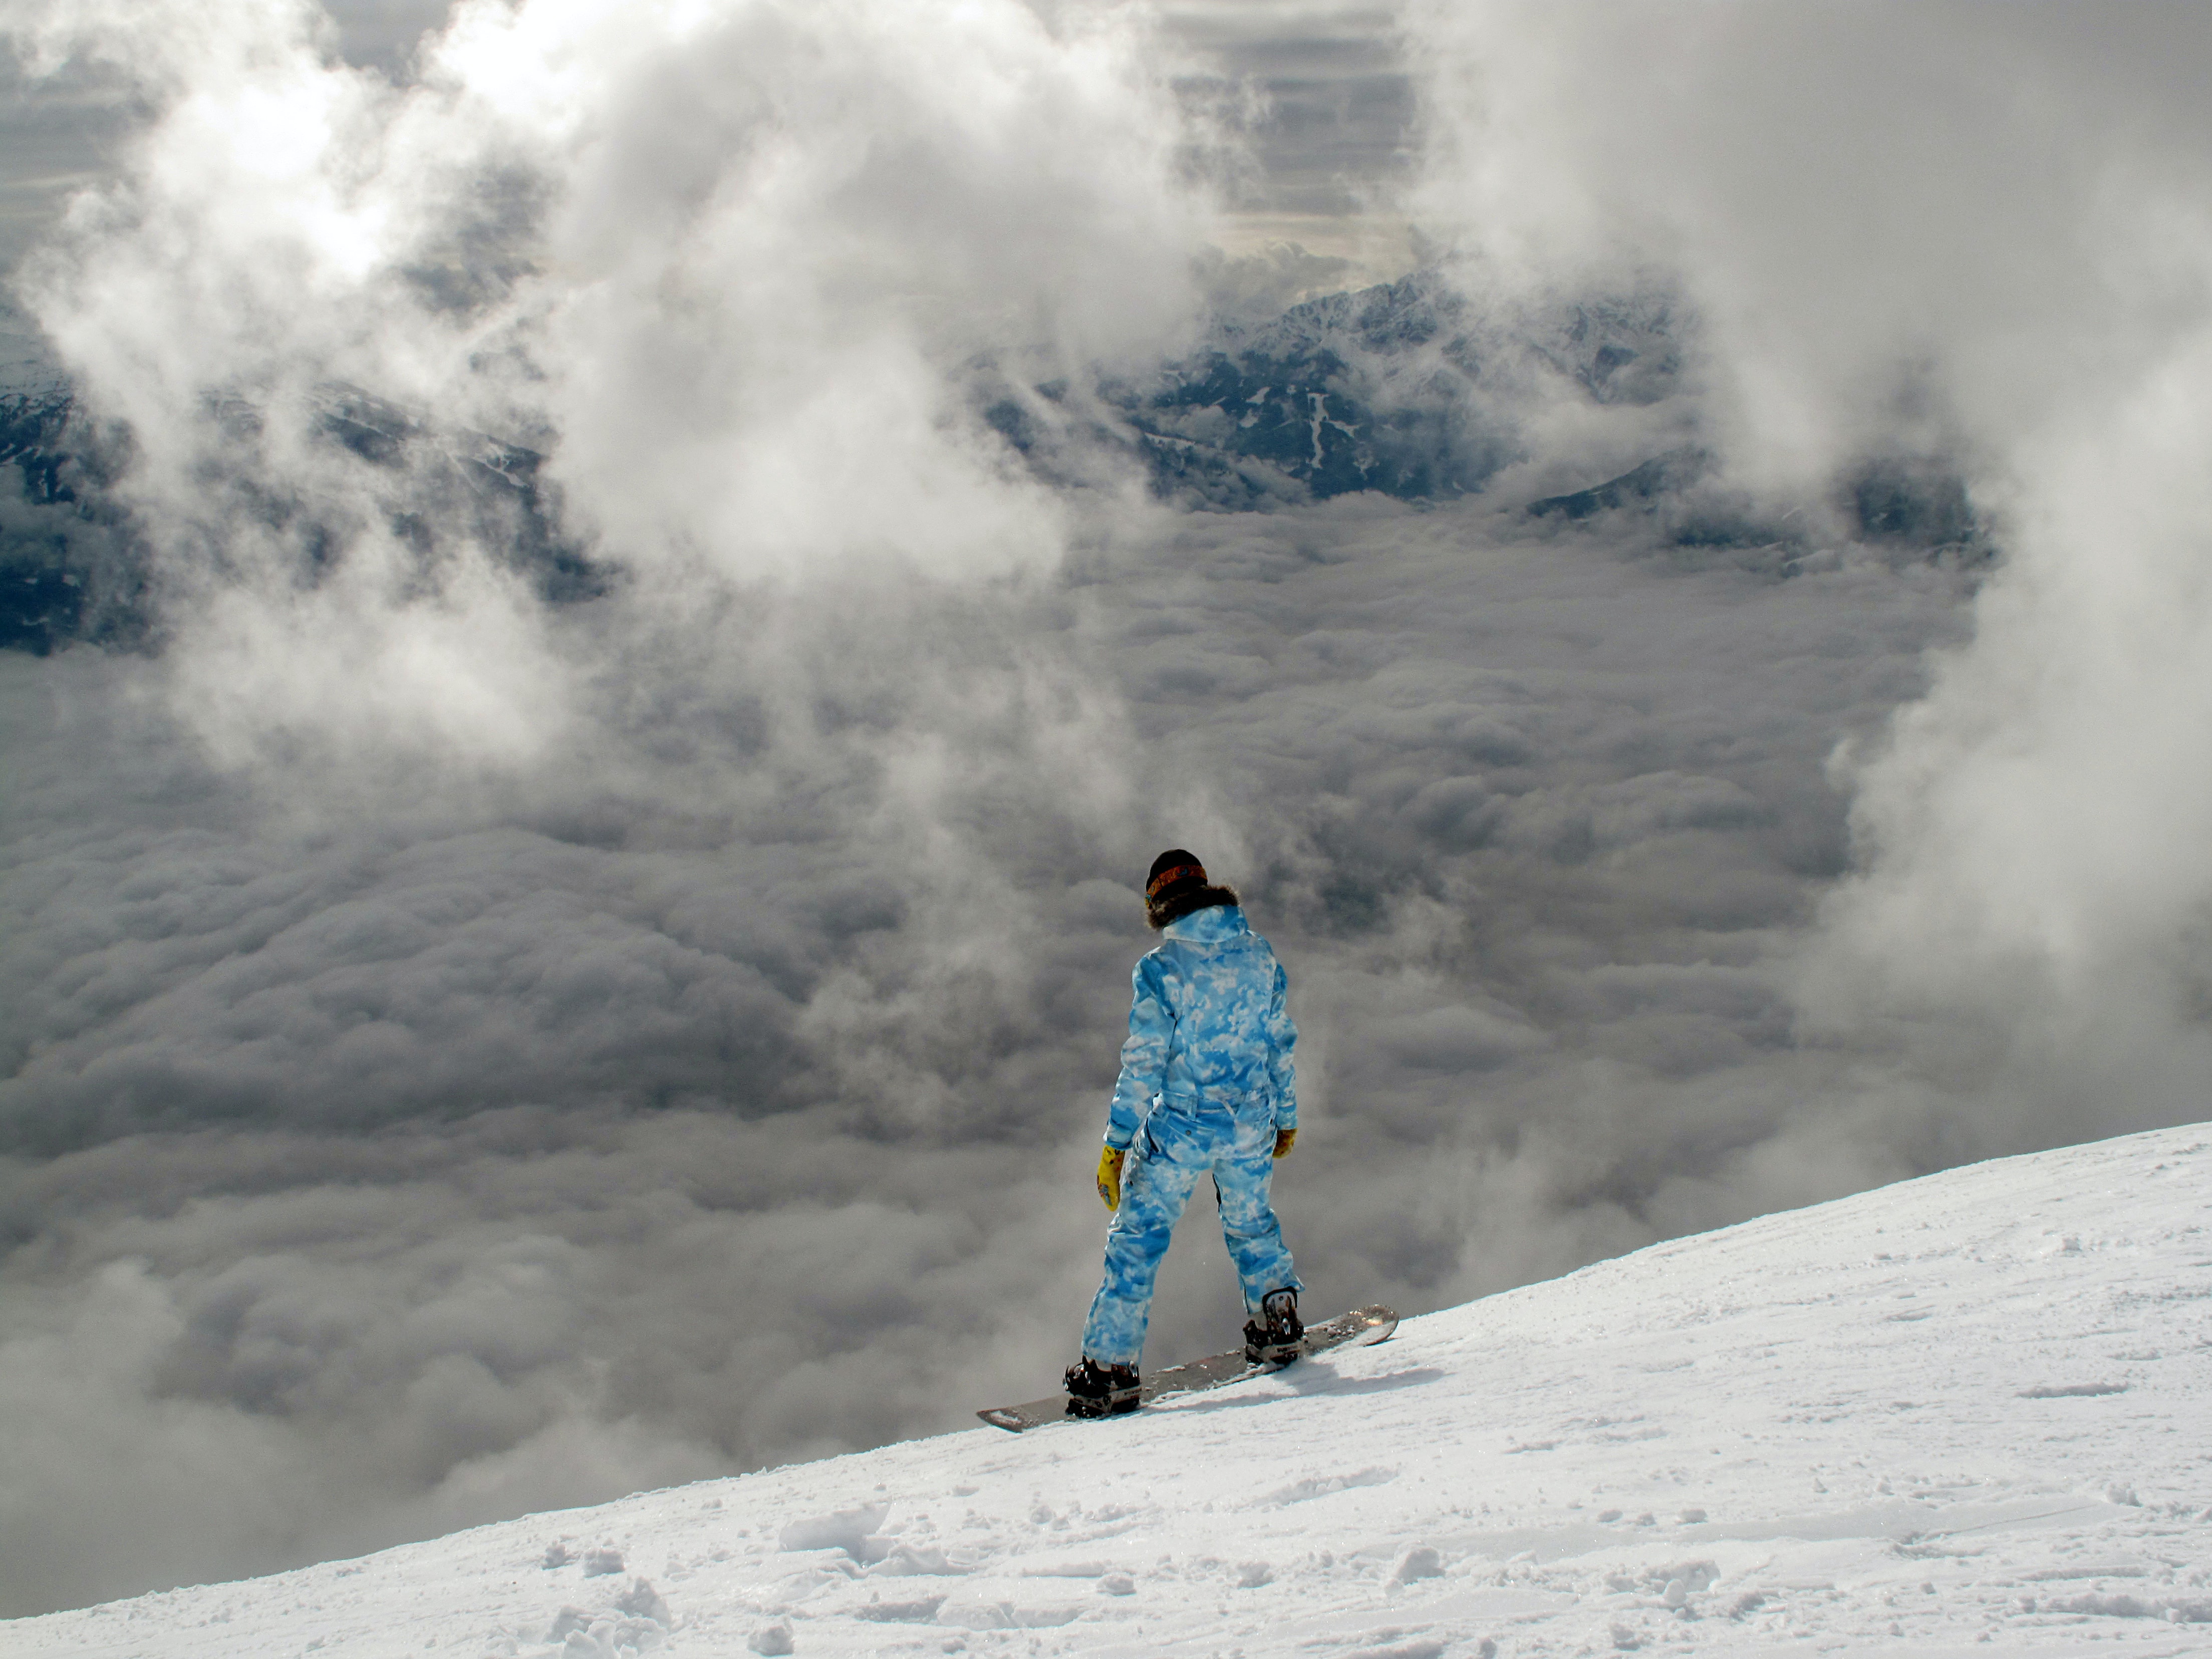 man on snowboard on snowfield